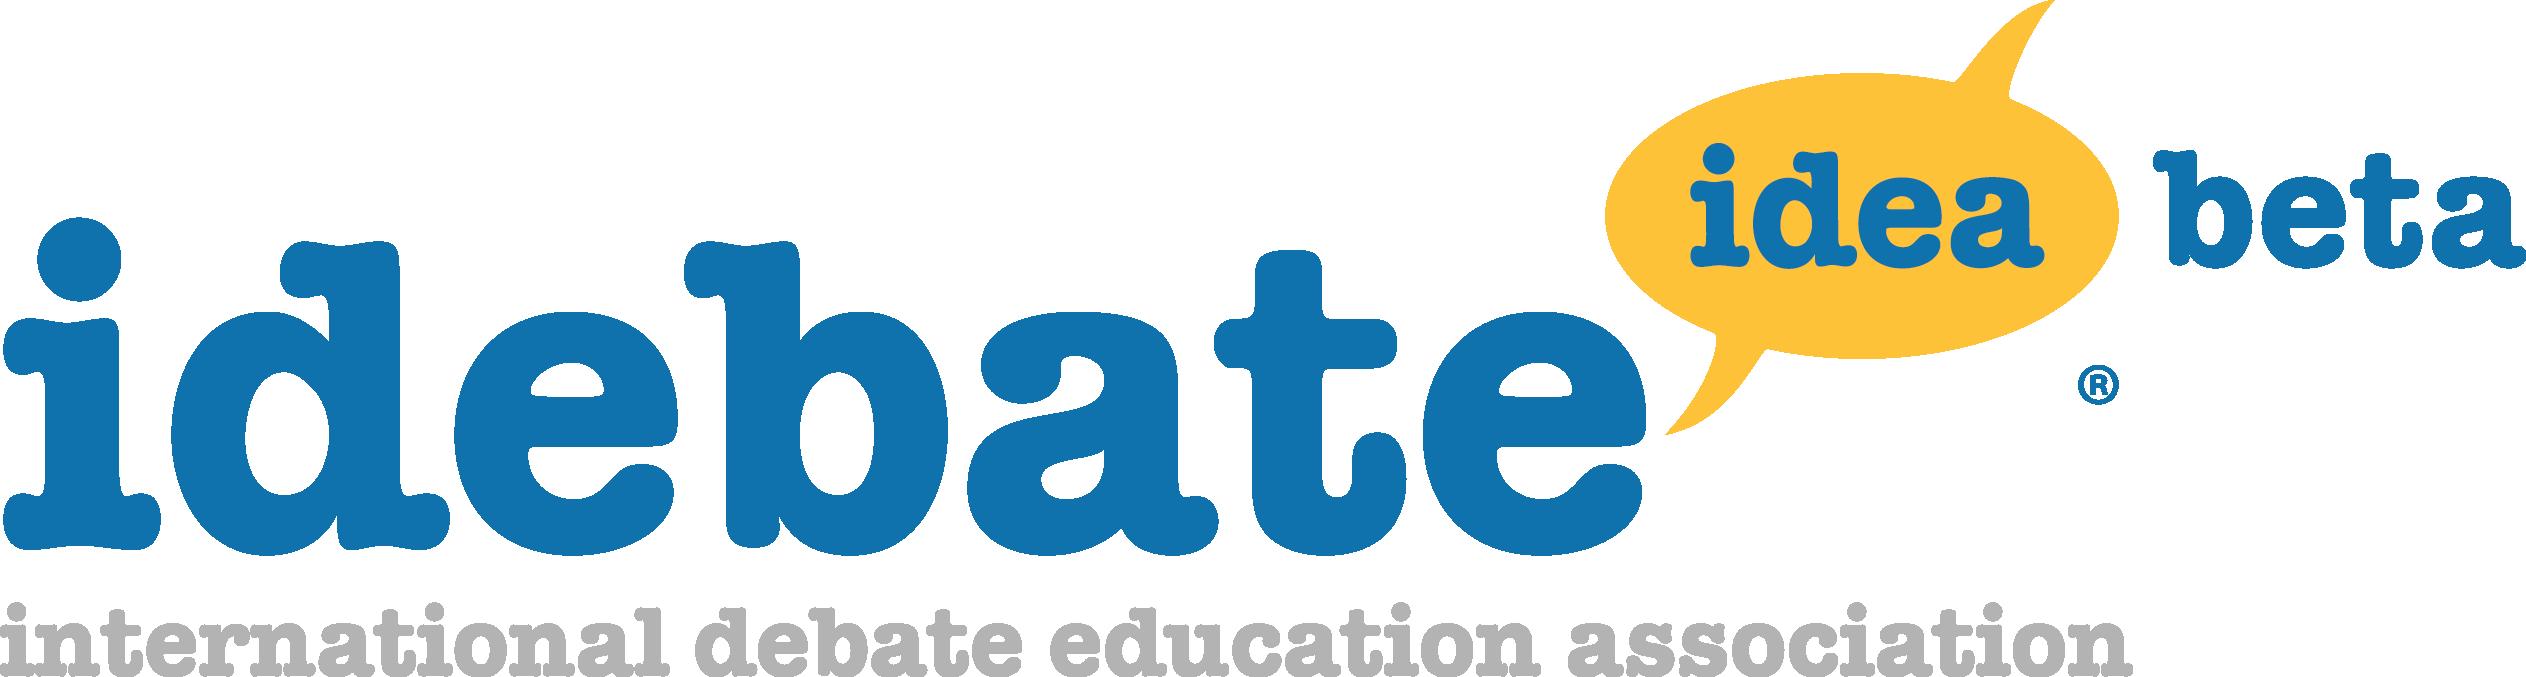 International education association idea. Competition clipart debate club